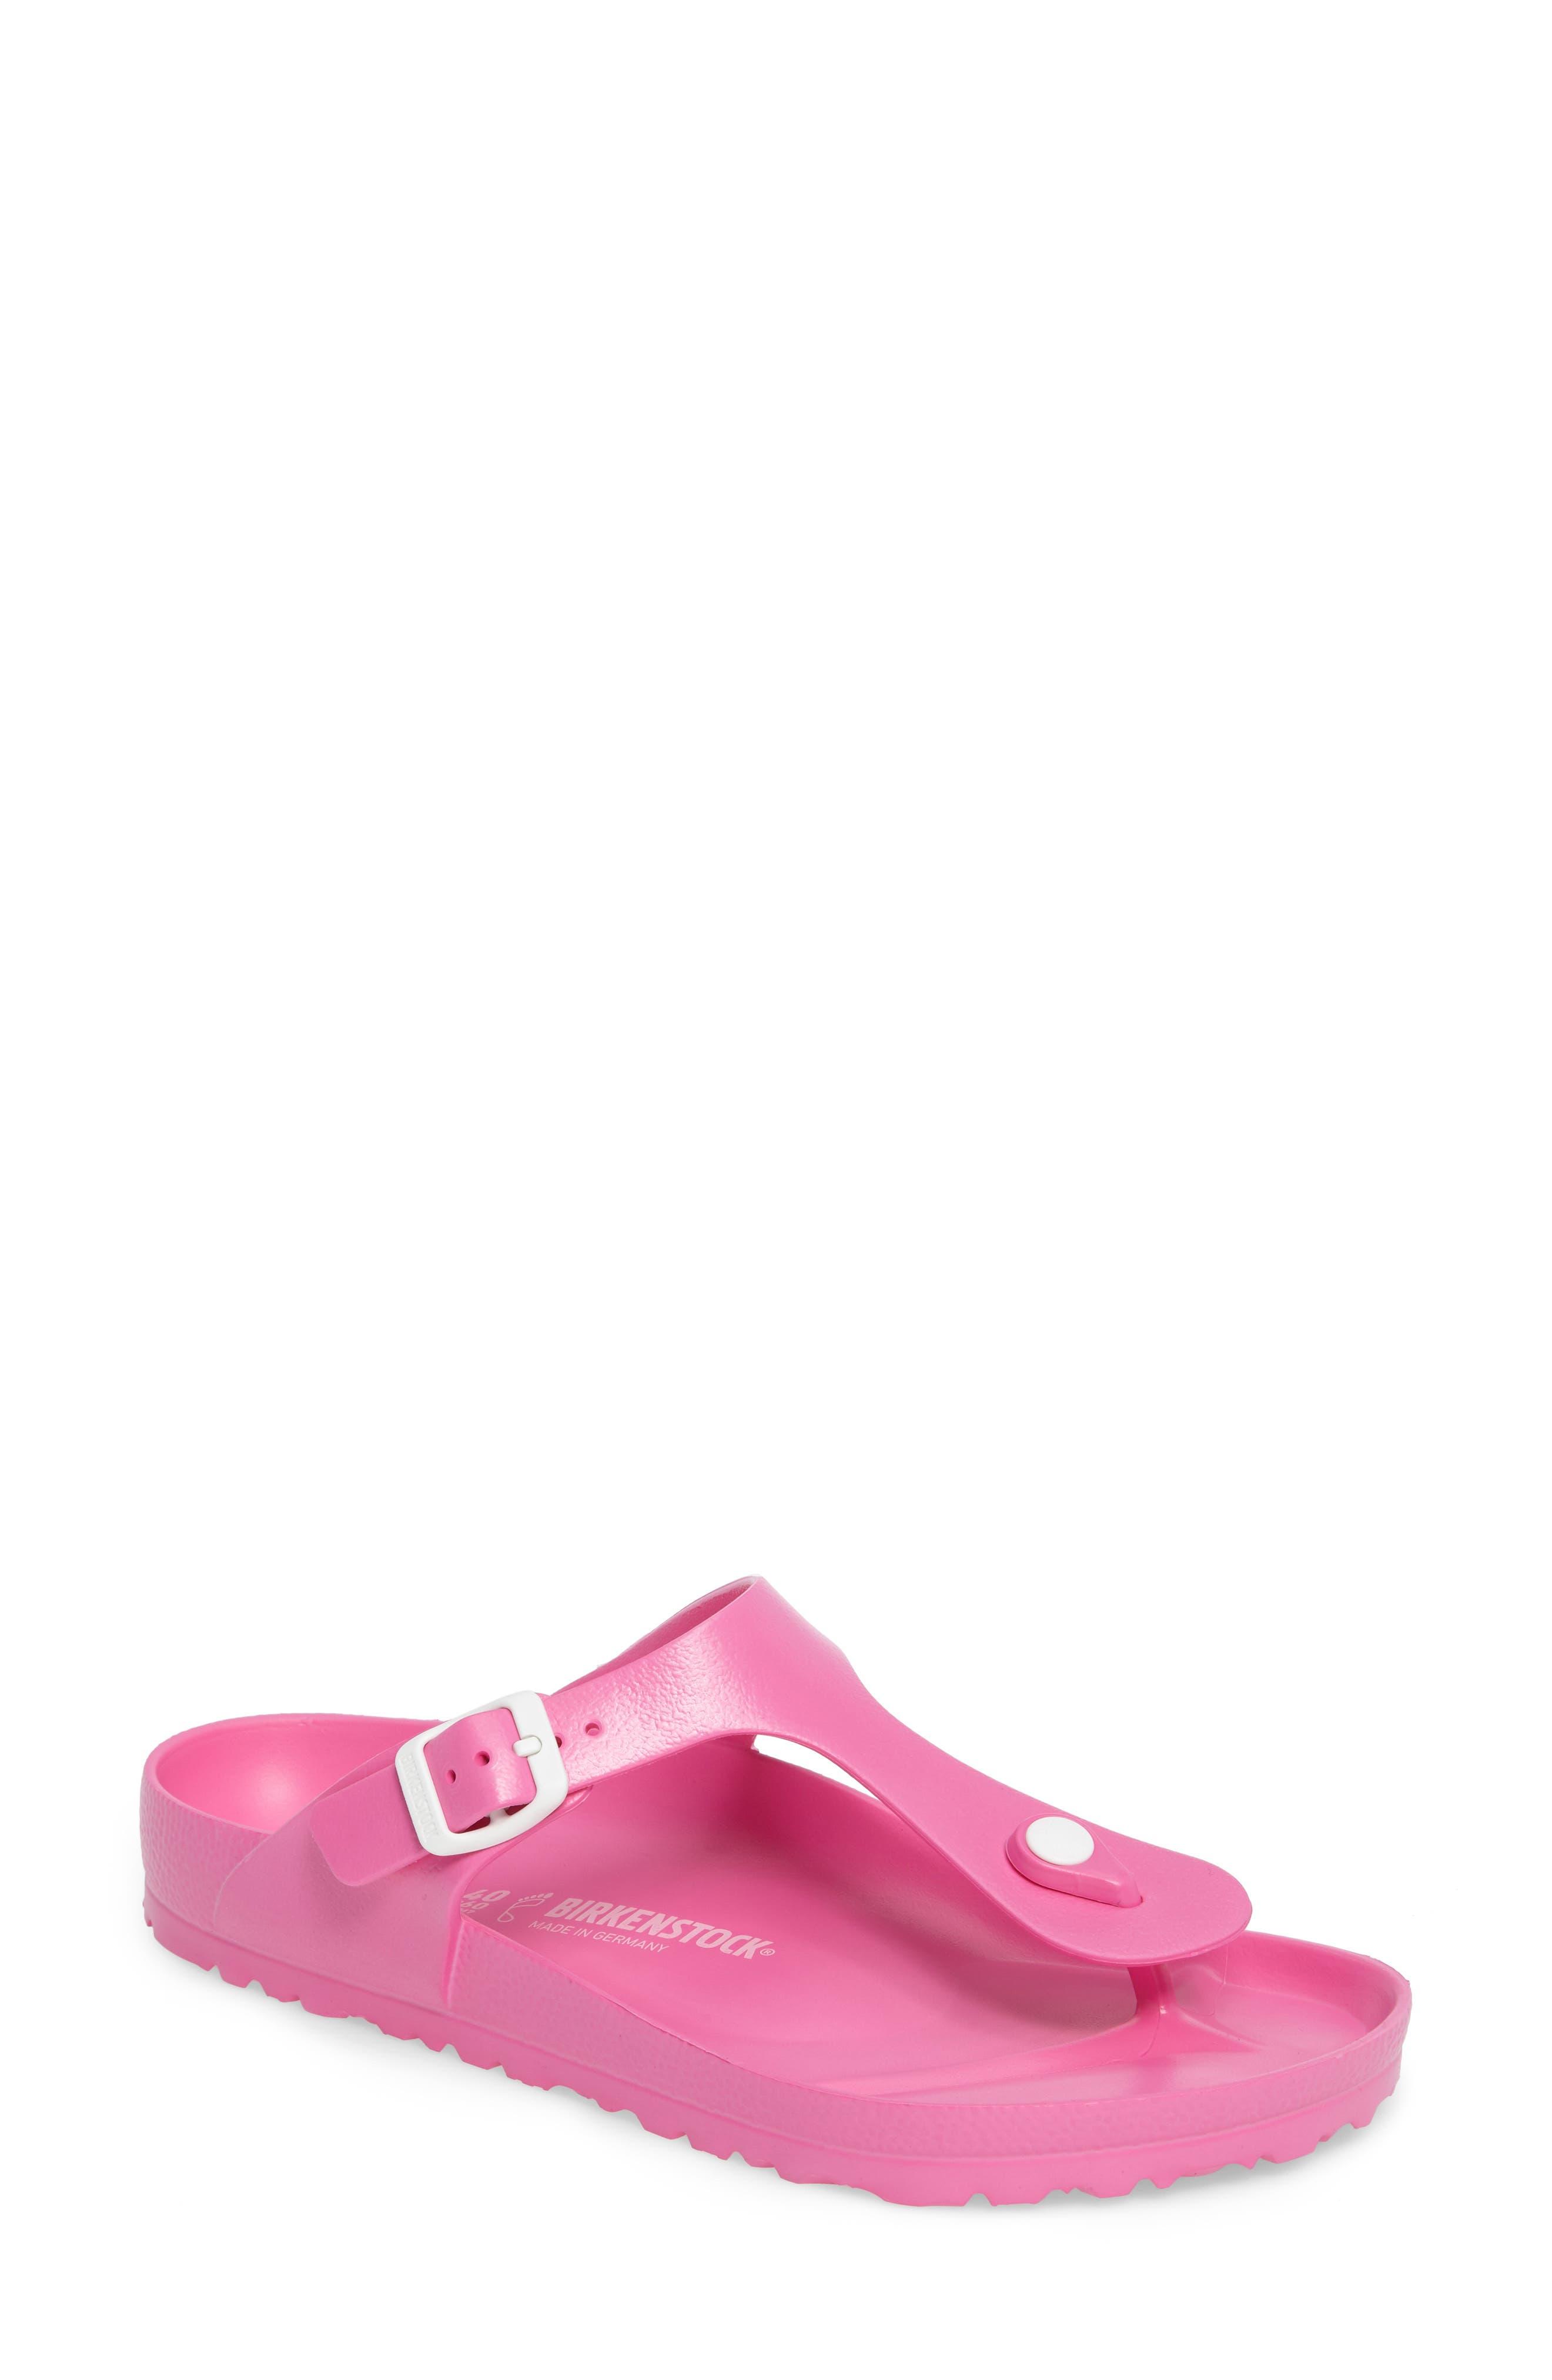 Birkenstock Gizeh EVA Flip Flop (Women)